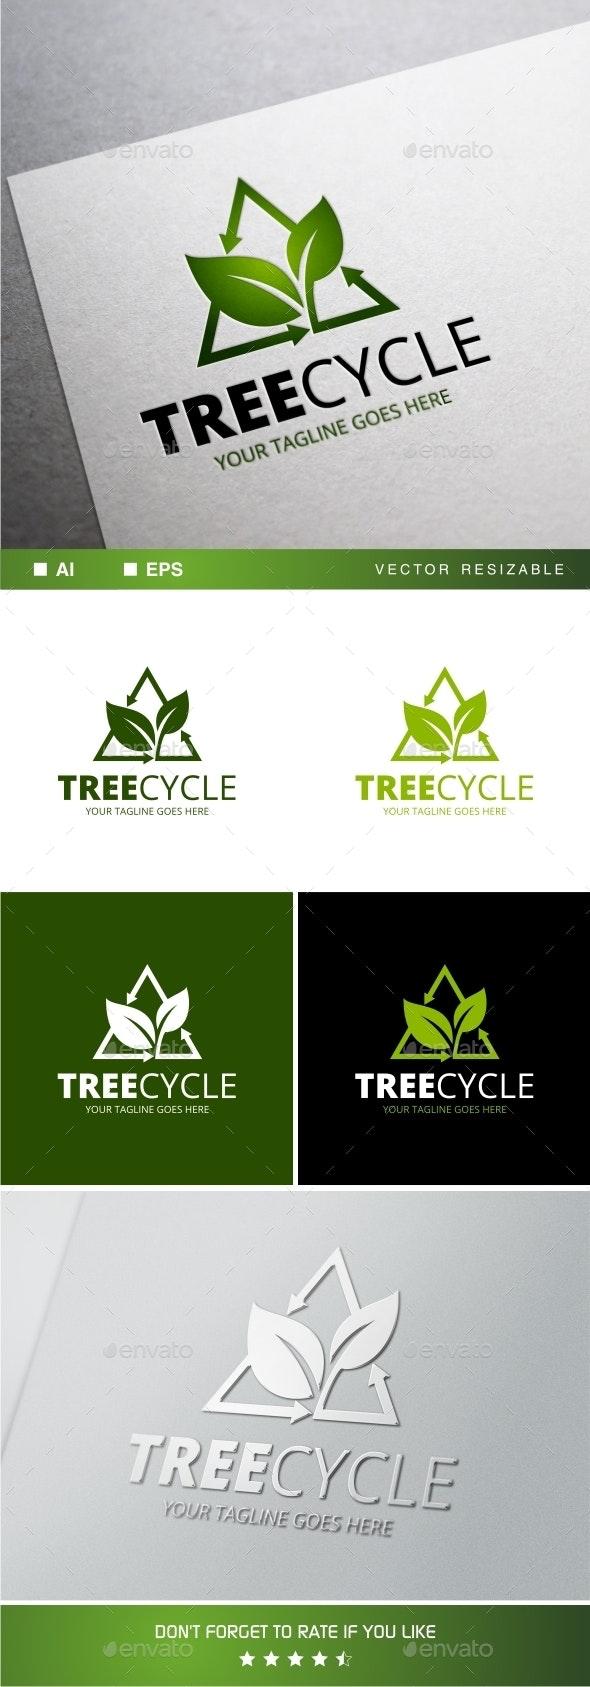 Treecycle Logo Template